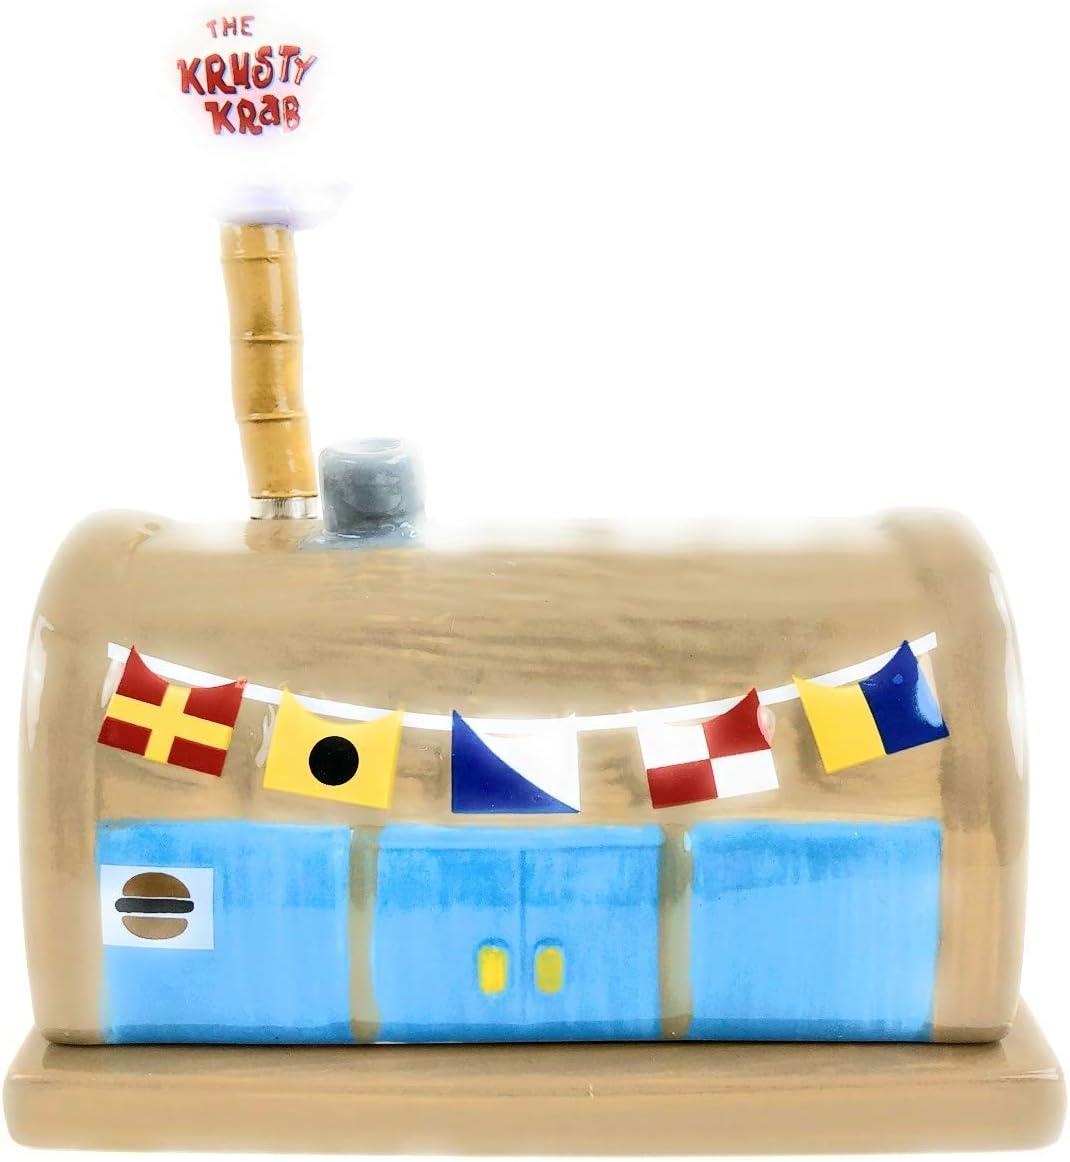 Sponge Bob Squarepants - Krusty Krab Ceramic Butterdish